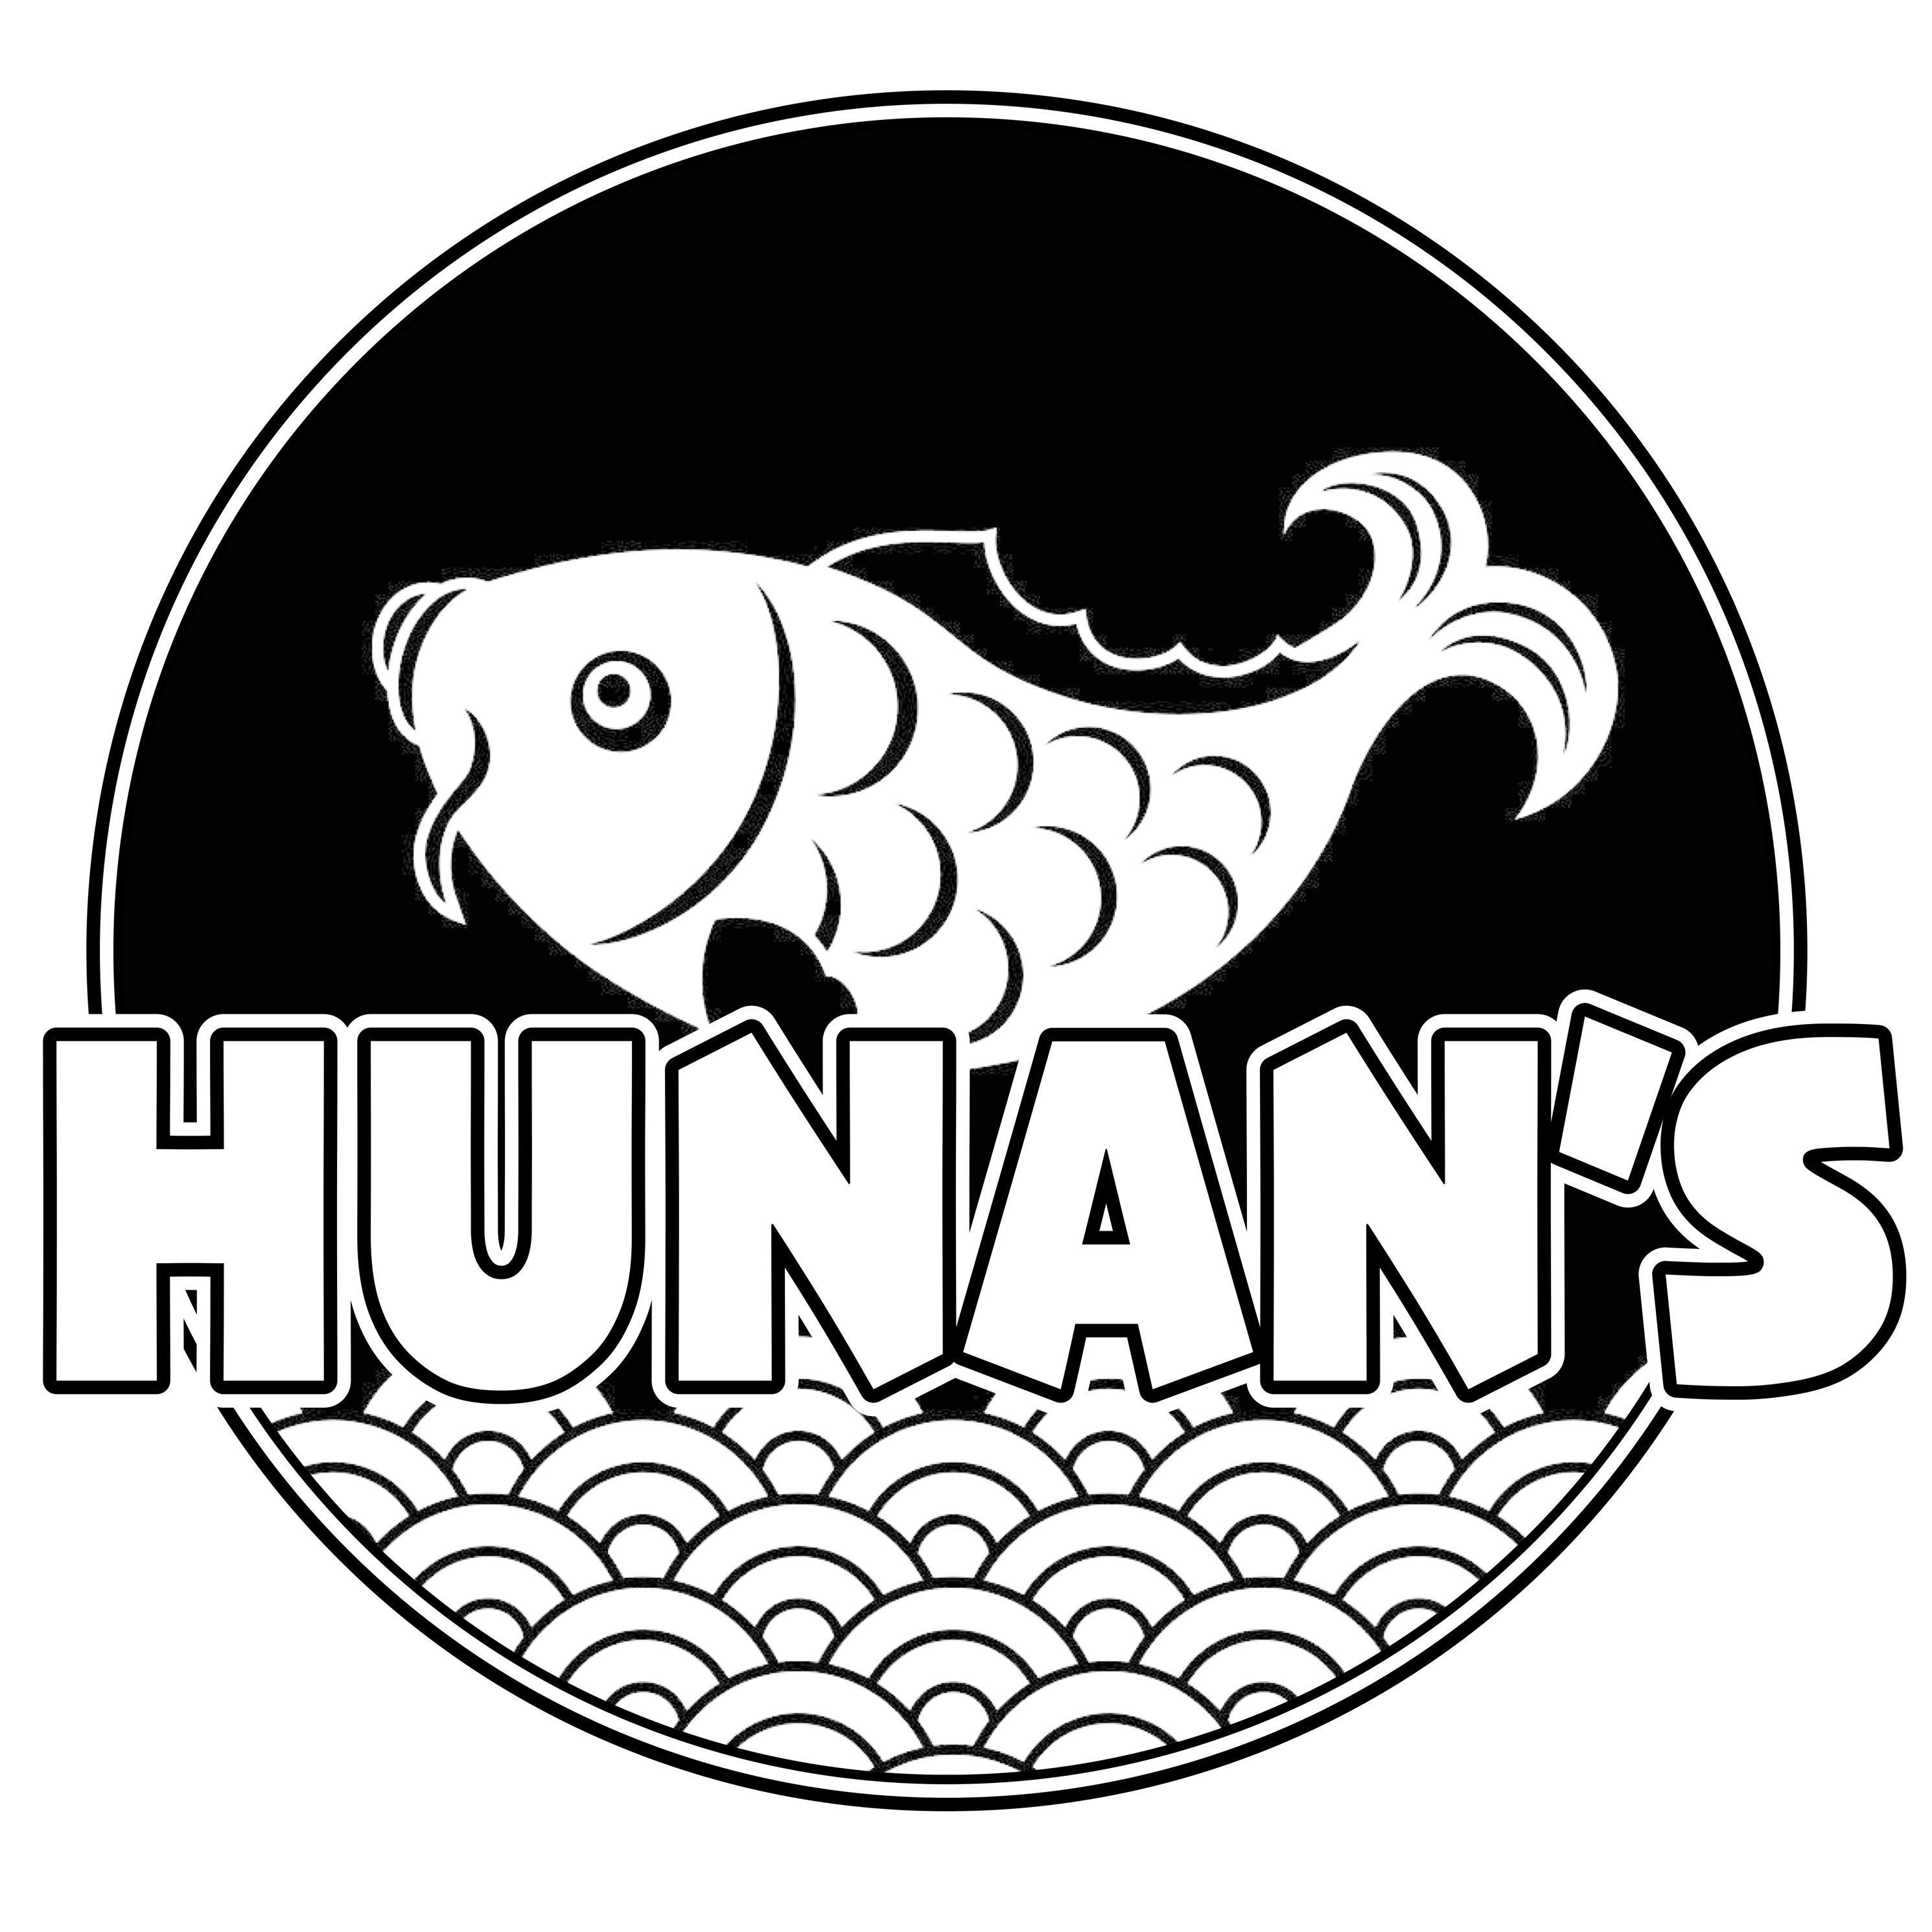 Hunan's Restaurant